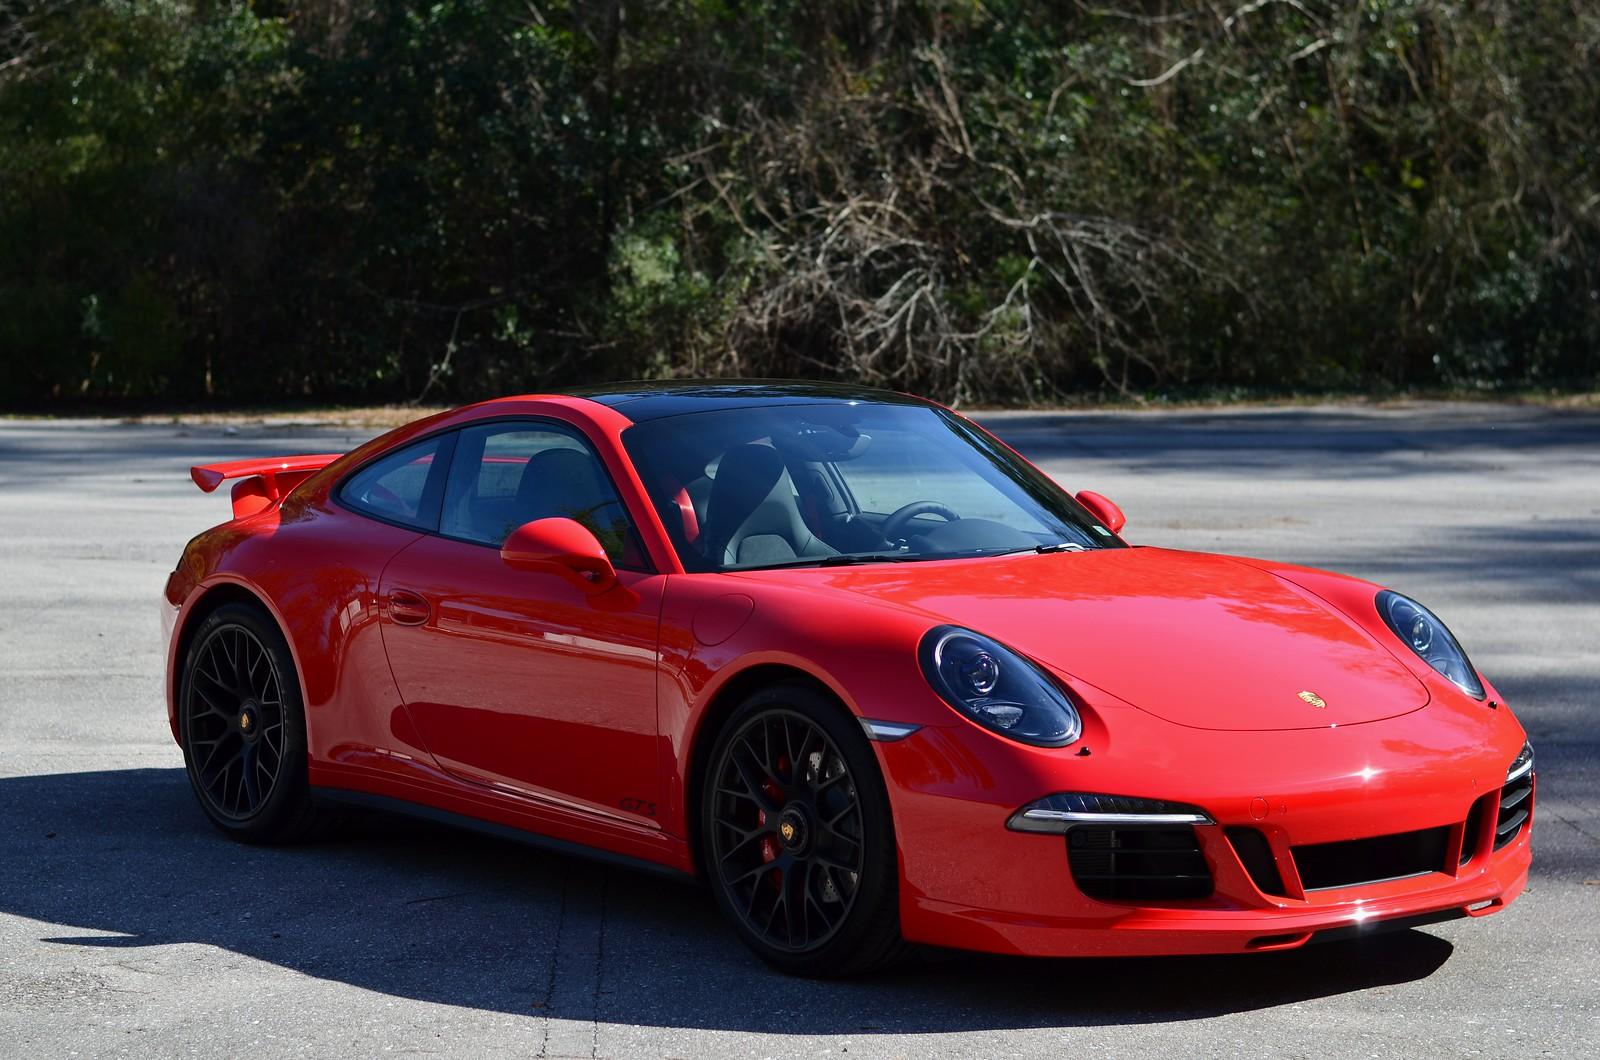 2015 911 Gts Coupe New Aerokit Cup Porsche Dealer In Fl